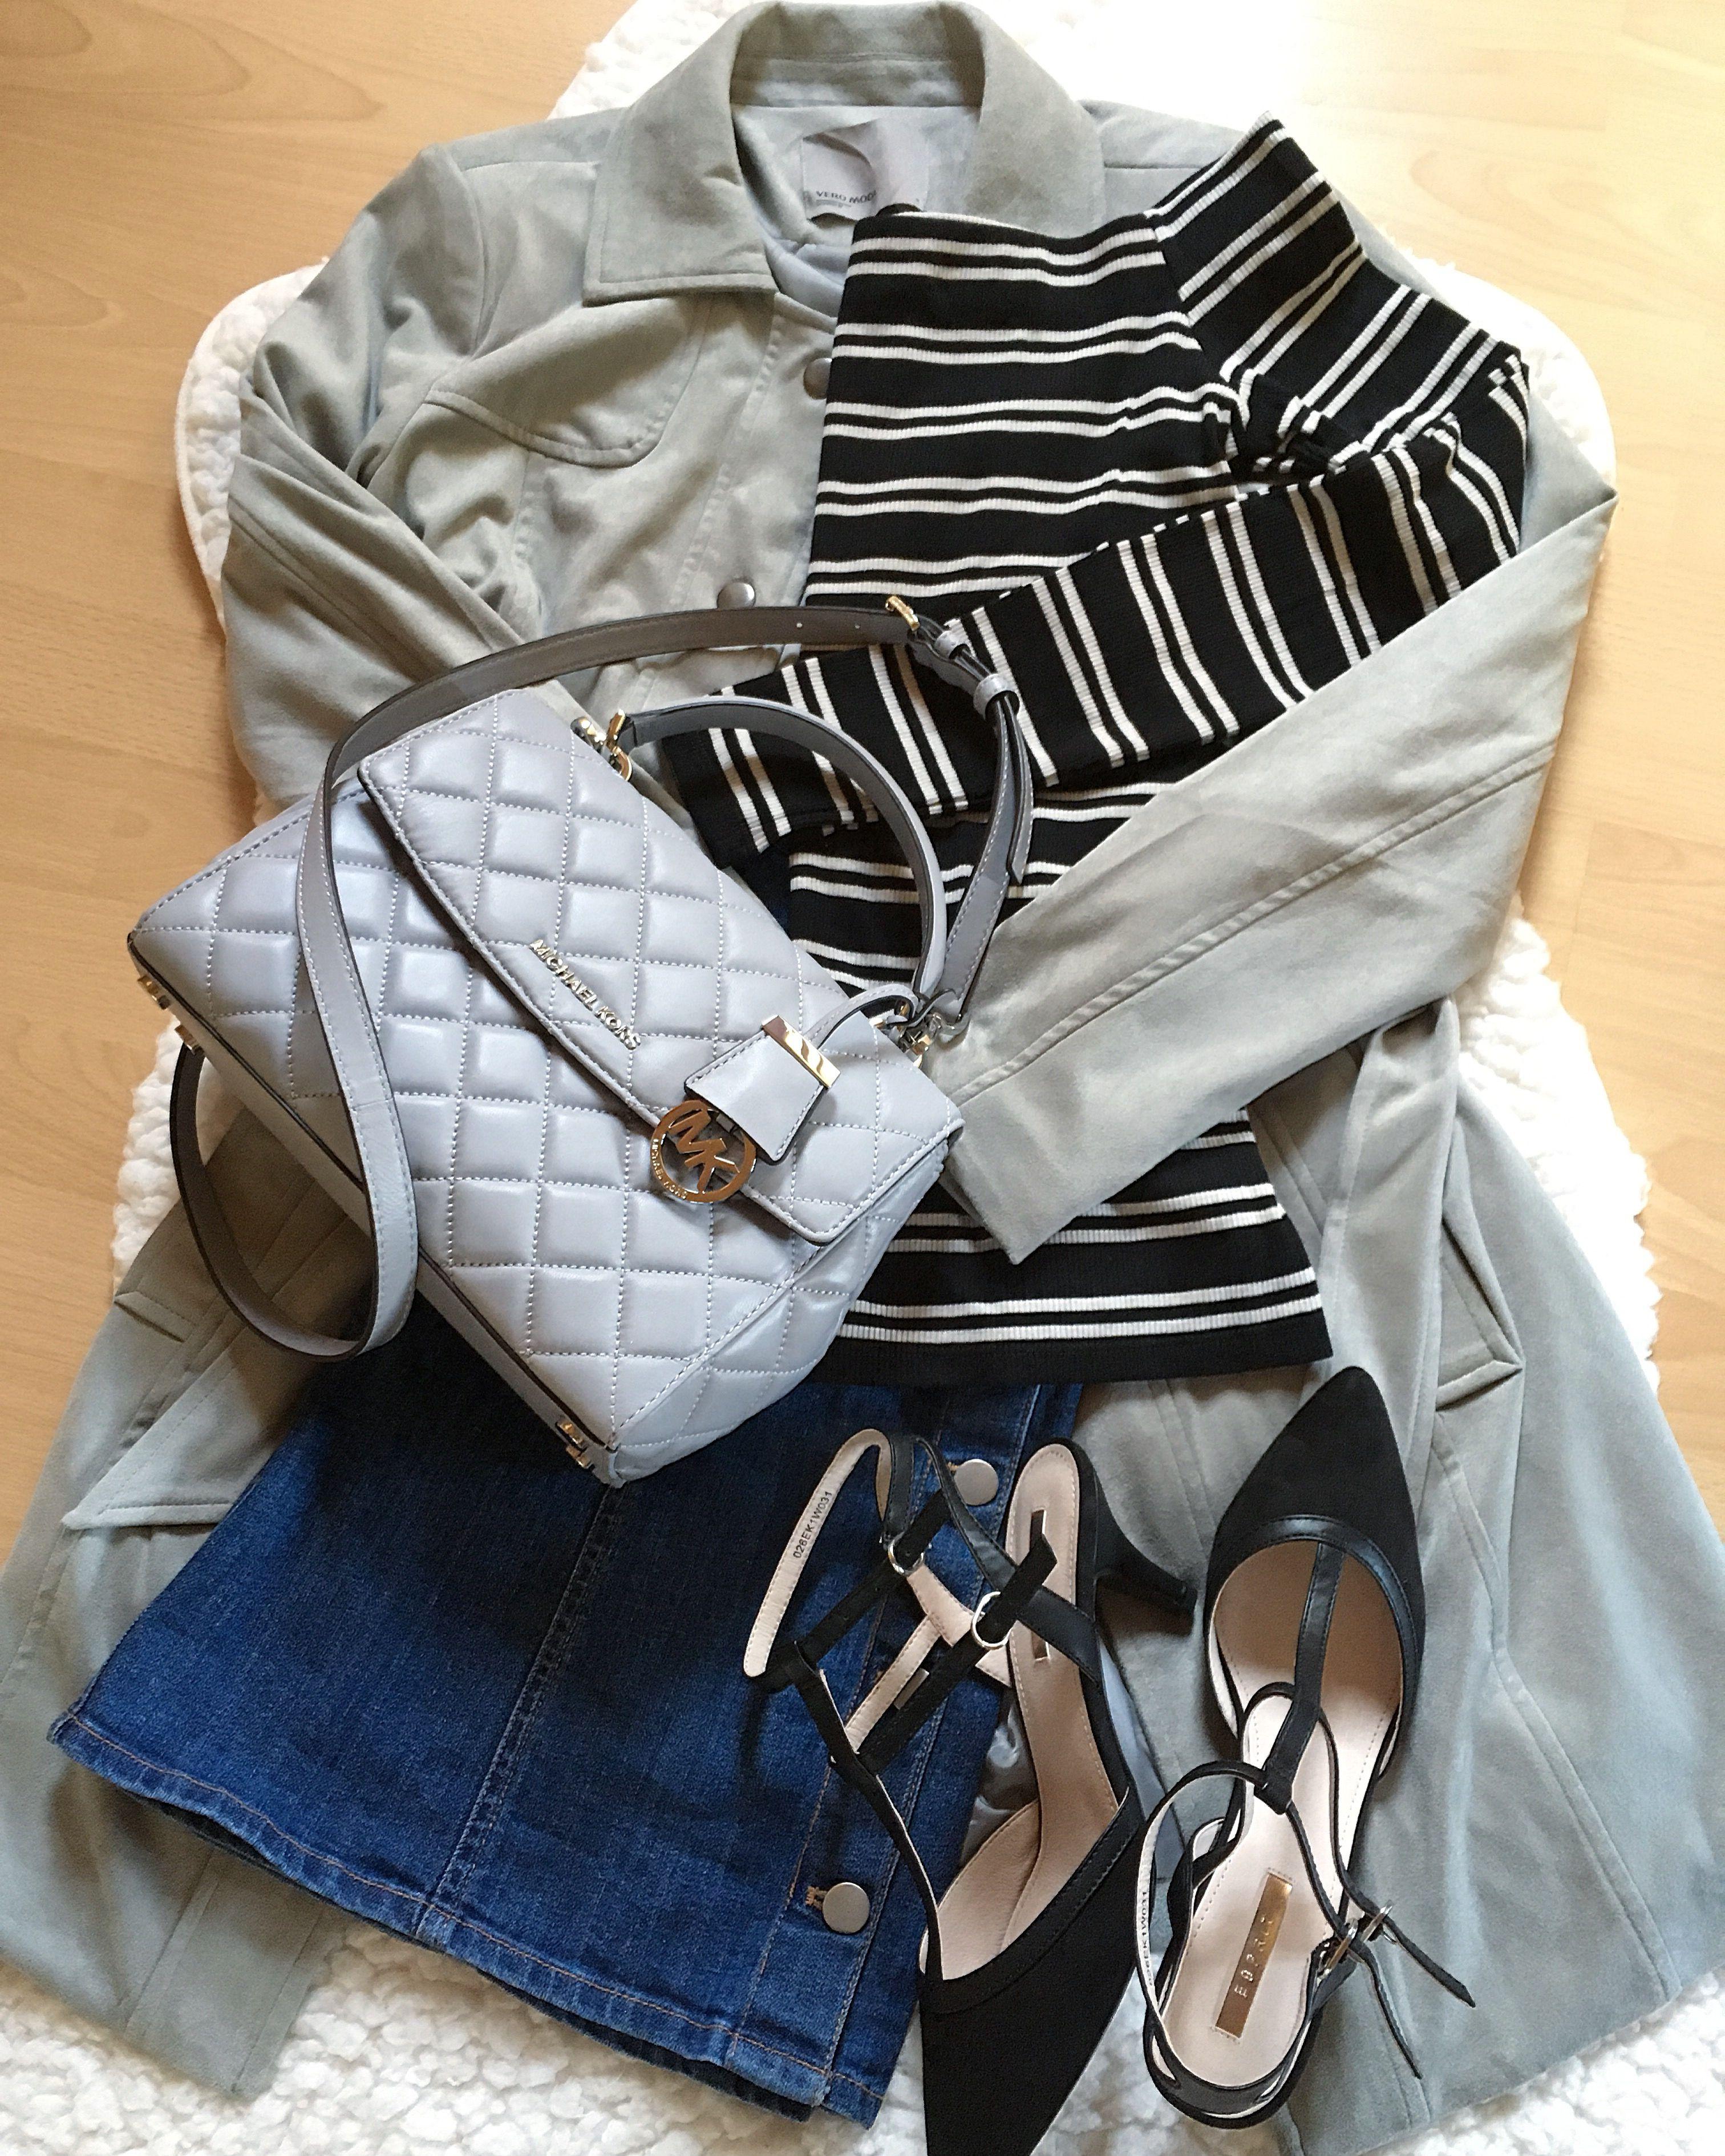 on sale 1c713 b18c0 Casual Outfit grauer Fake-Veloursledermantel schwarz-weißes ...